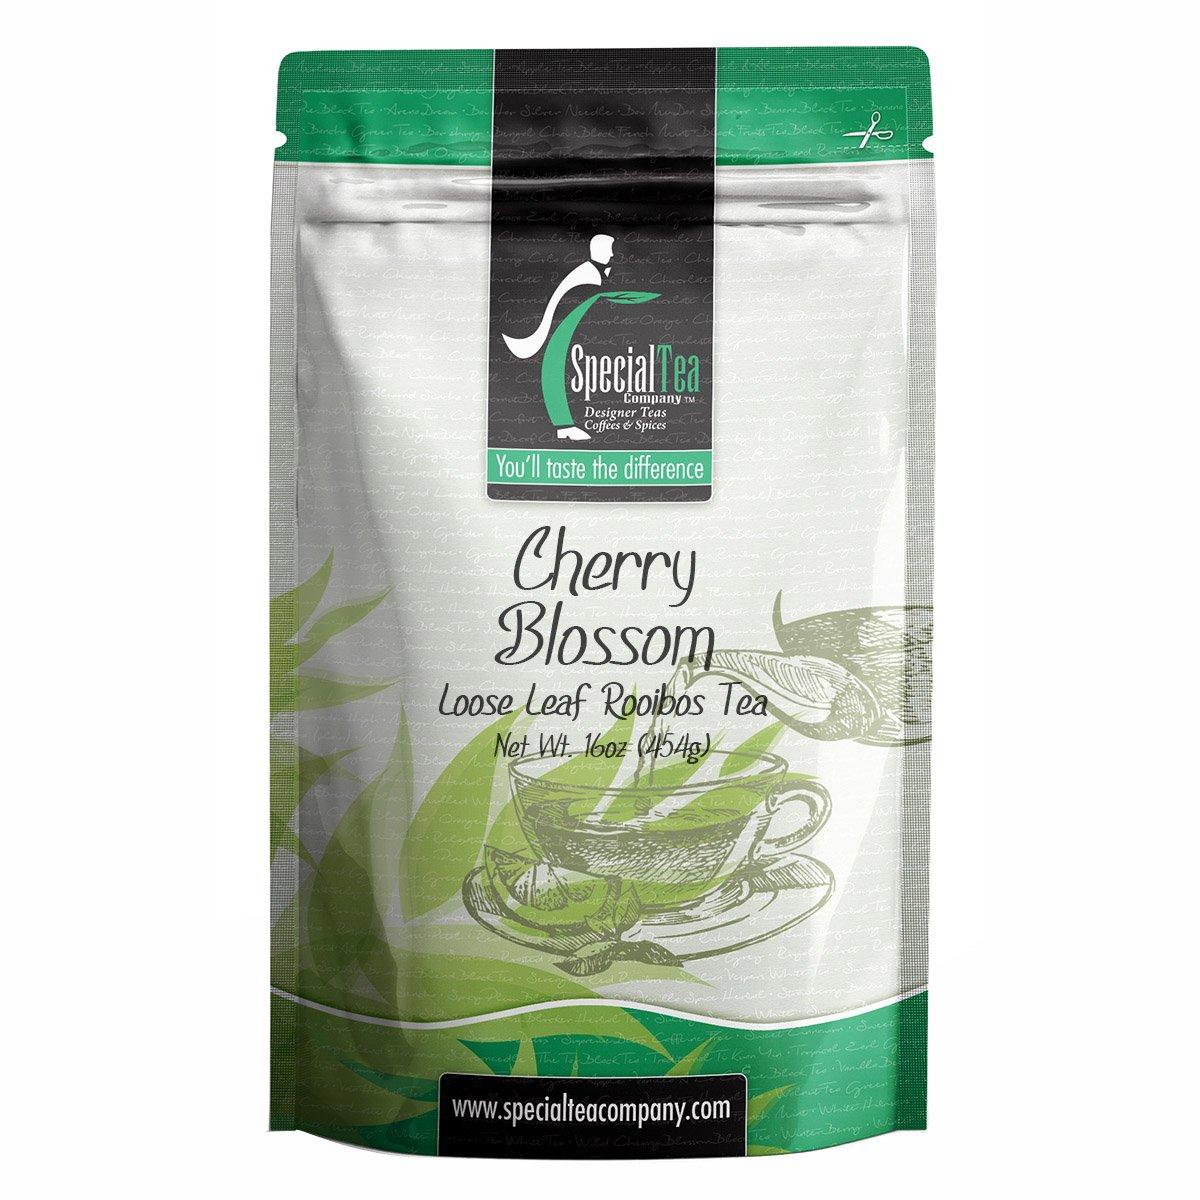 Special Tea Cherry Blossom Rooibos Tea, 16 Ounce